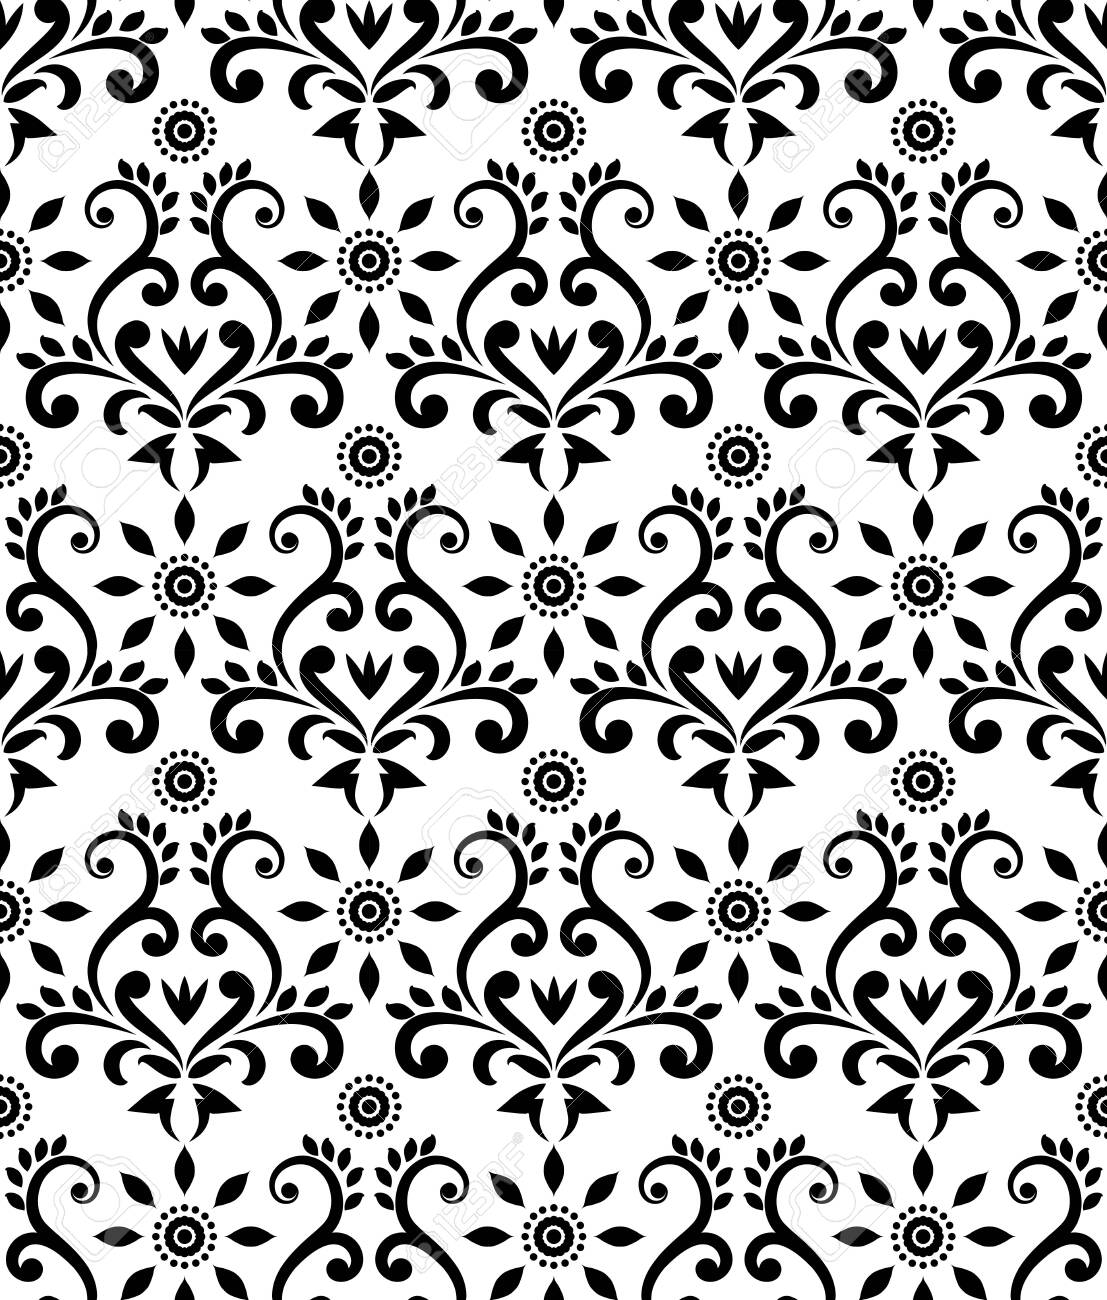 Vintage Damask Pattern Baroque Black And White Wallpaper Decor